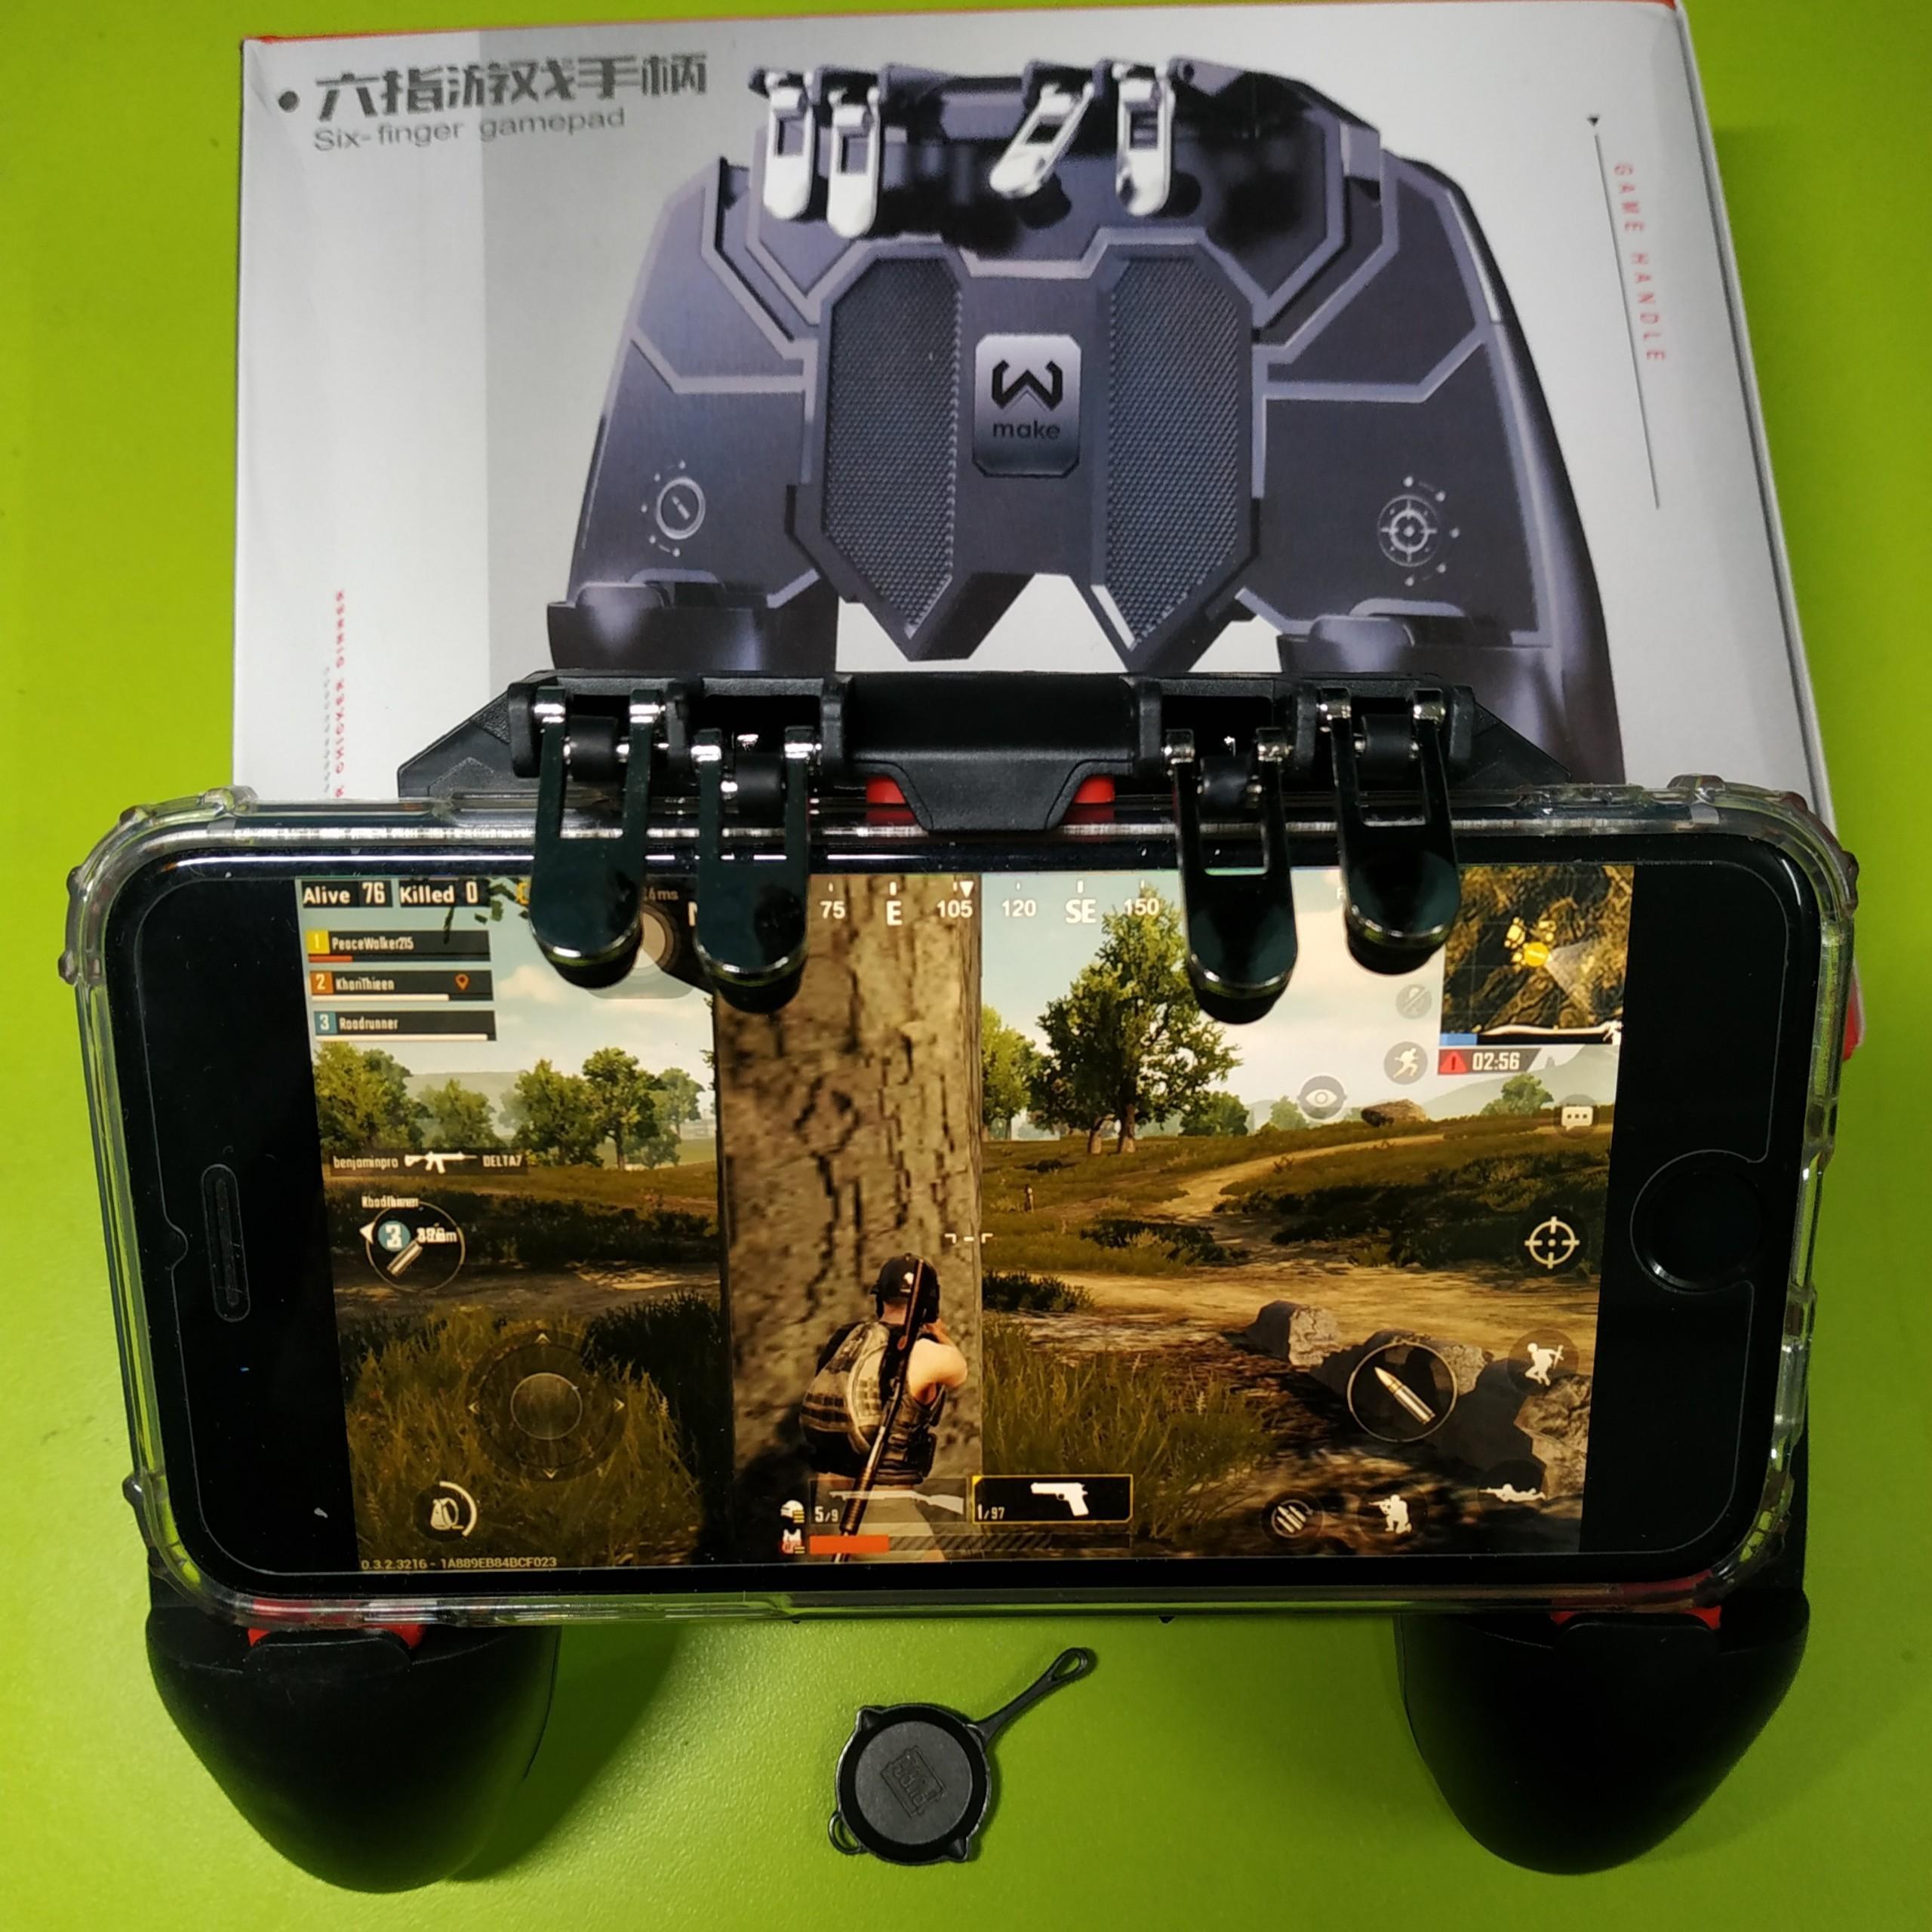 Tay cầm chơi game PUBG AK-66 - Tặng 1 chảo sắt PUBG